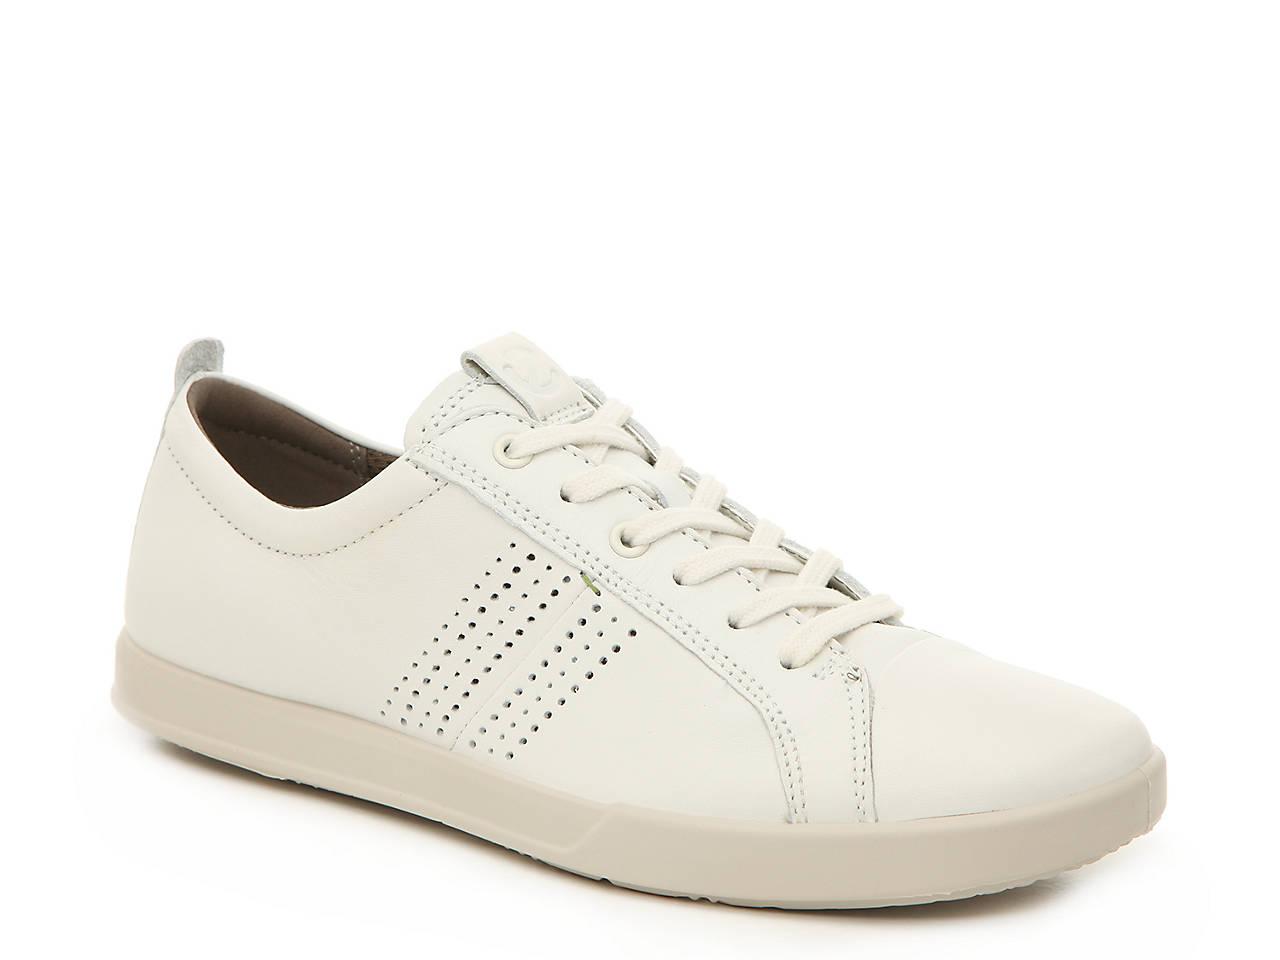 182d5a09b8 Collin 2.0 Sneaker